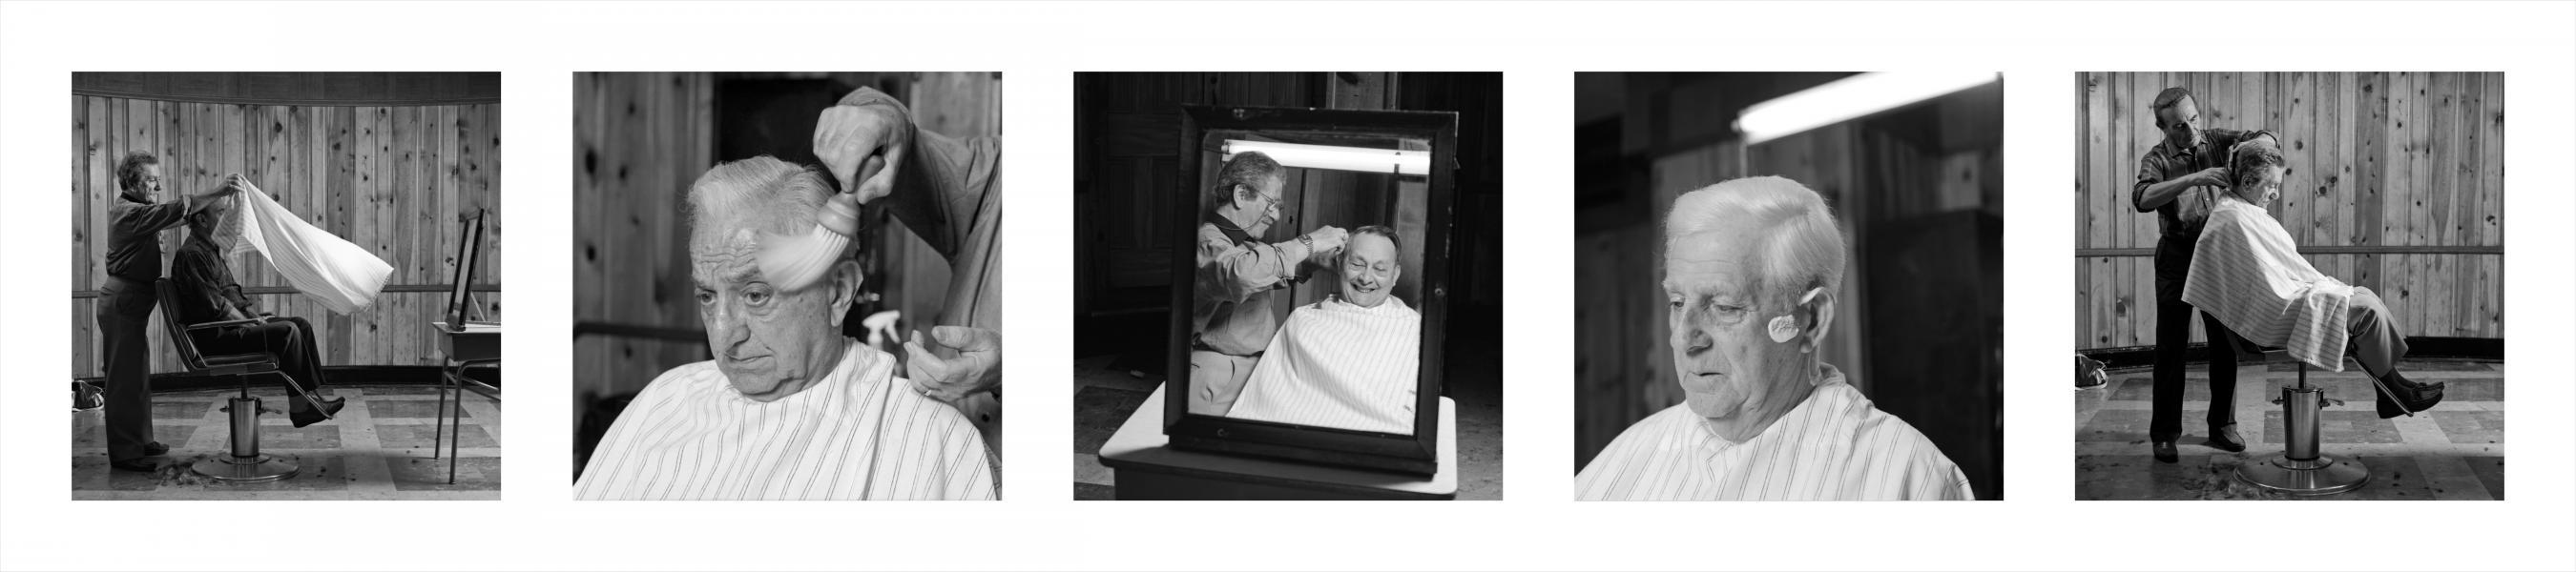 Little Italy, Baltimore, St. Leo's Church, Basement haircuts